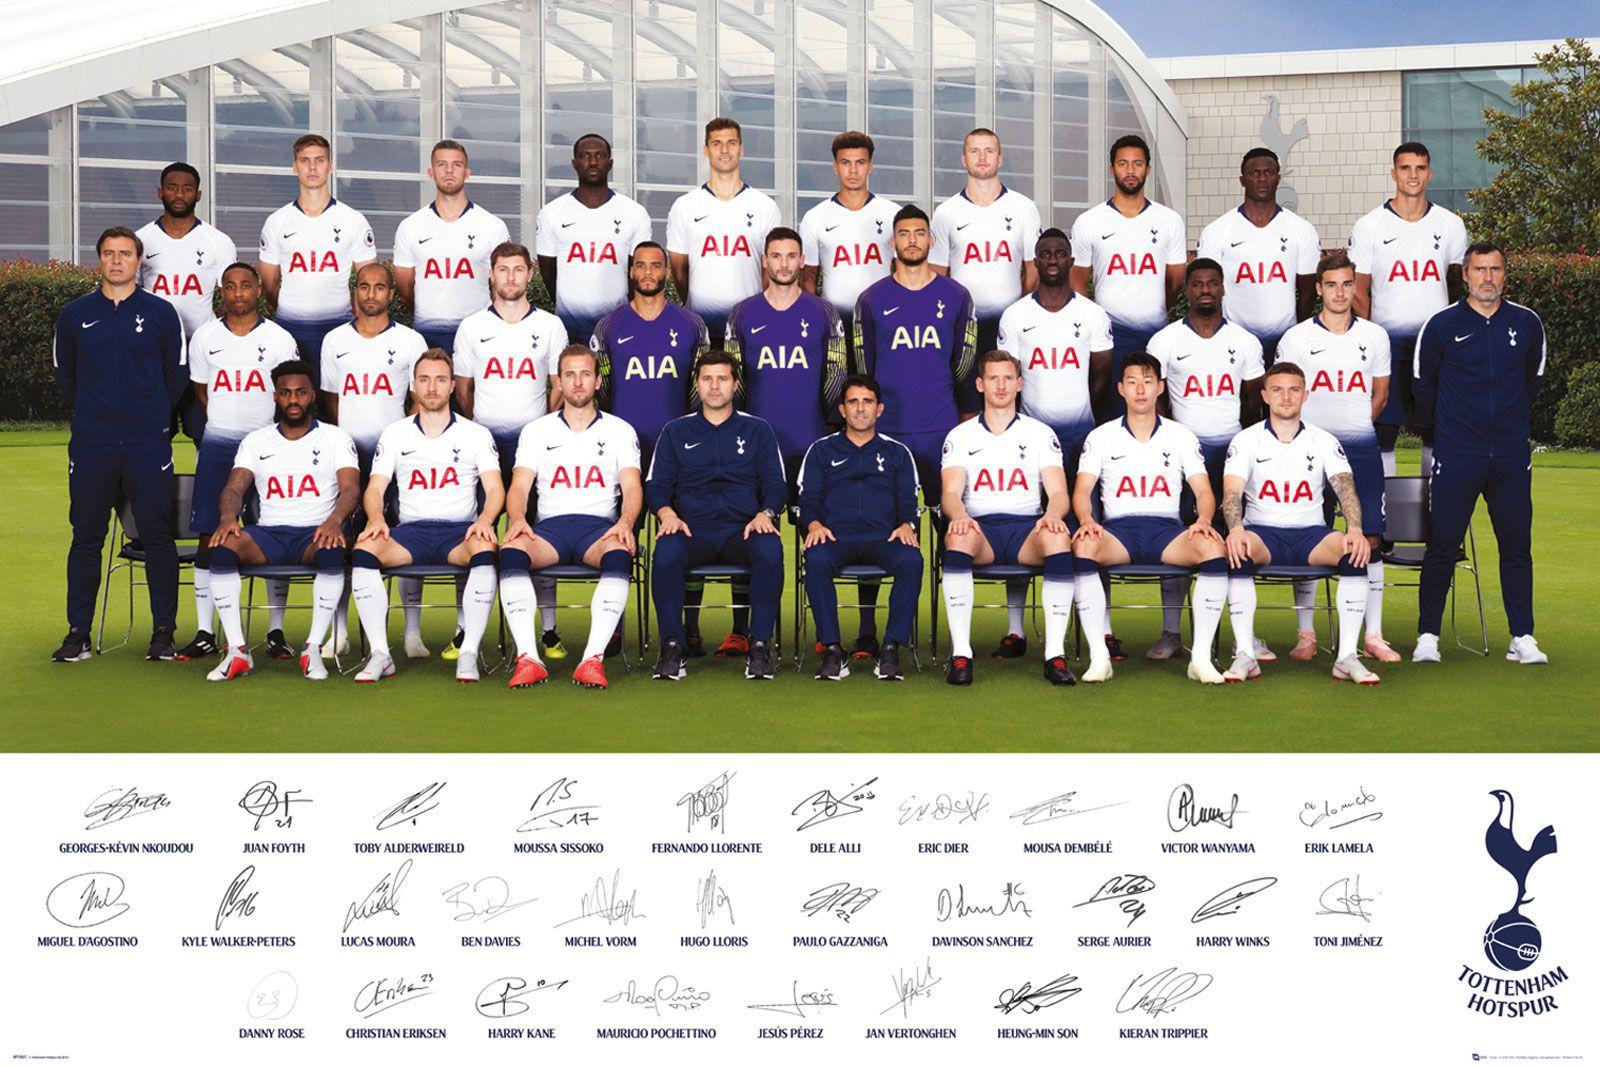 Tottenham Hotspur Zawodnicy 1819 Plakat